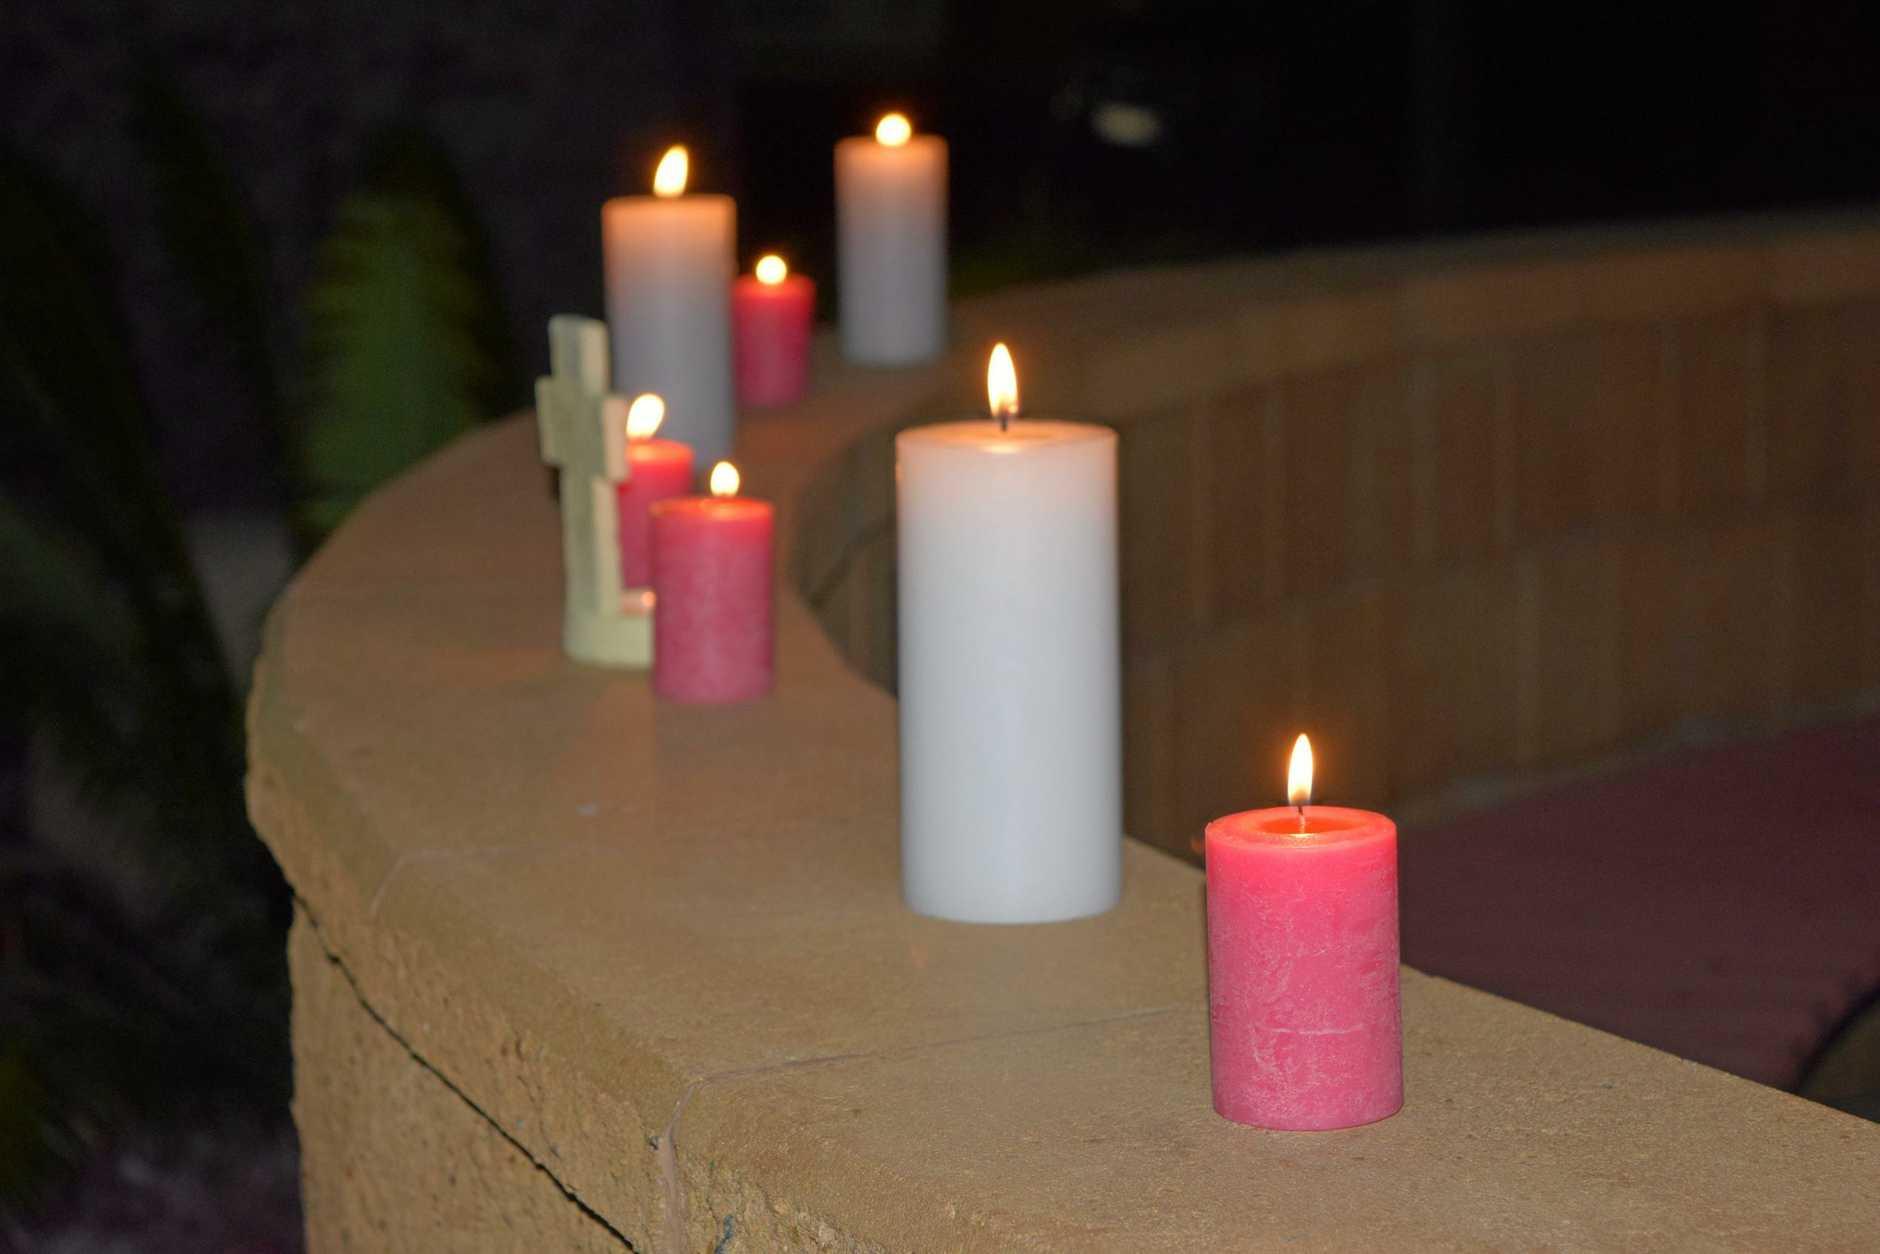 candle lighting ceremony tonight